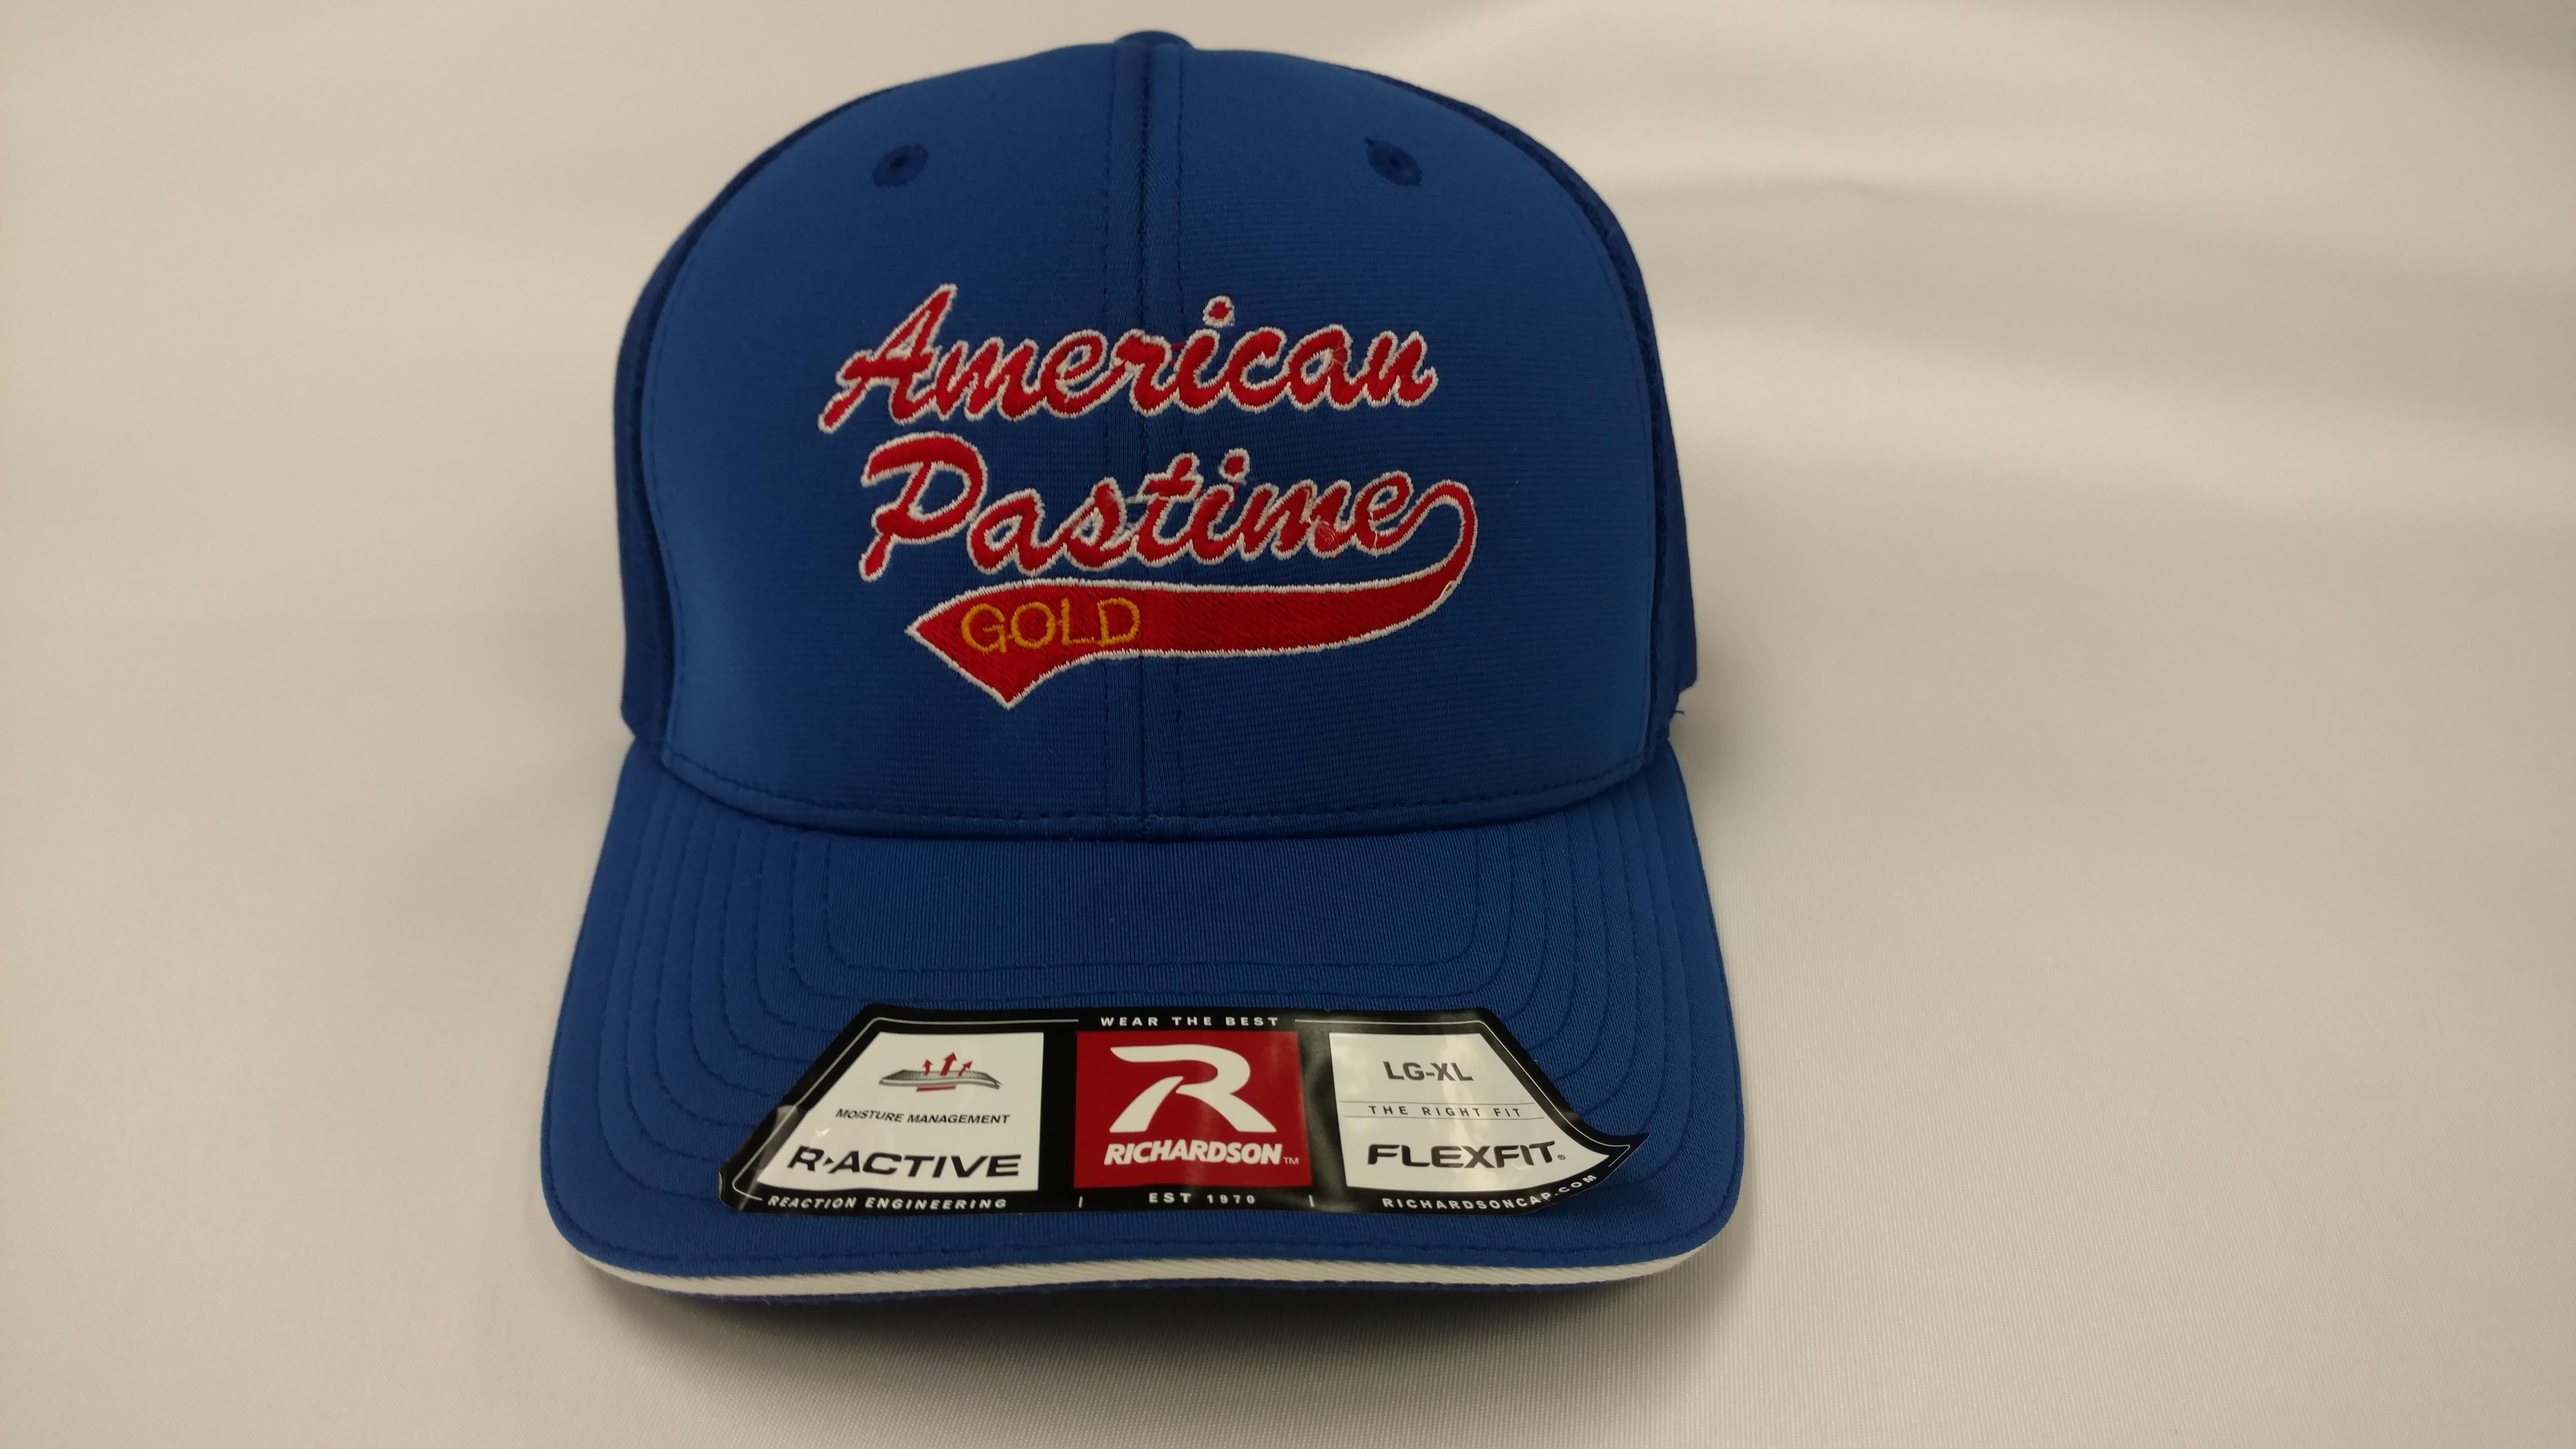 bb1ff0f13c7b6 Home   American Pastime Softball   Richardson PTS40 moisture performance hat  w American Pastime logo